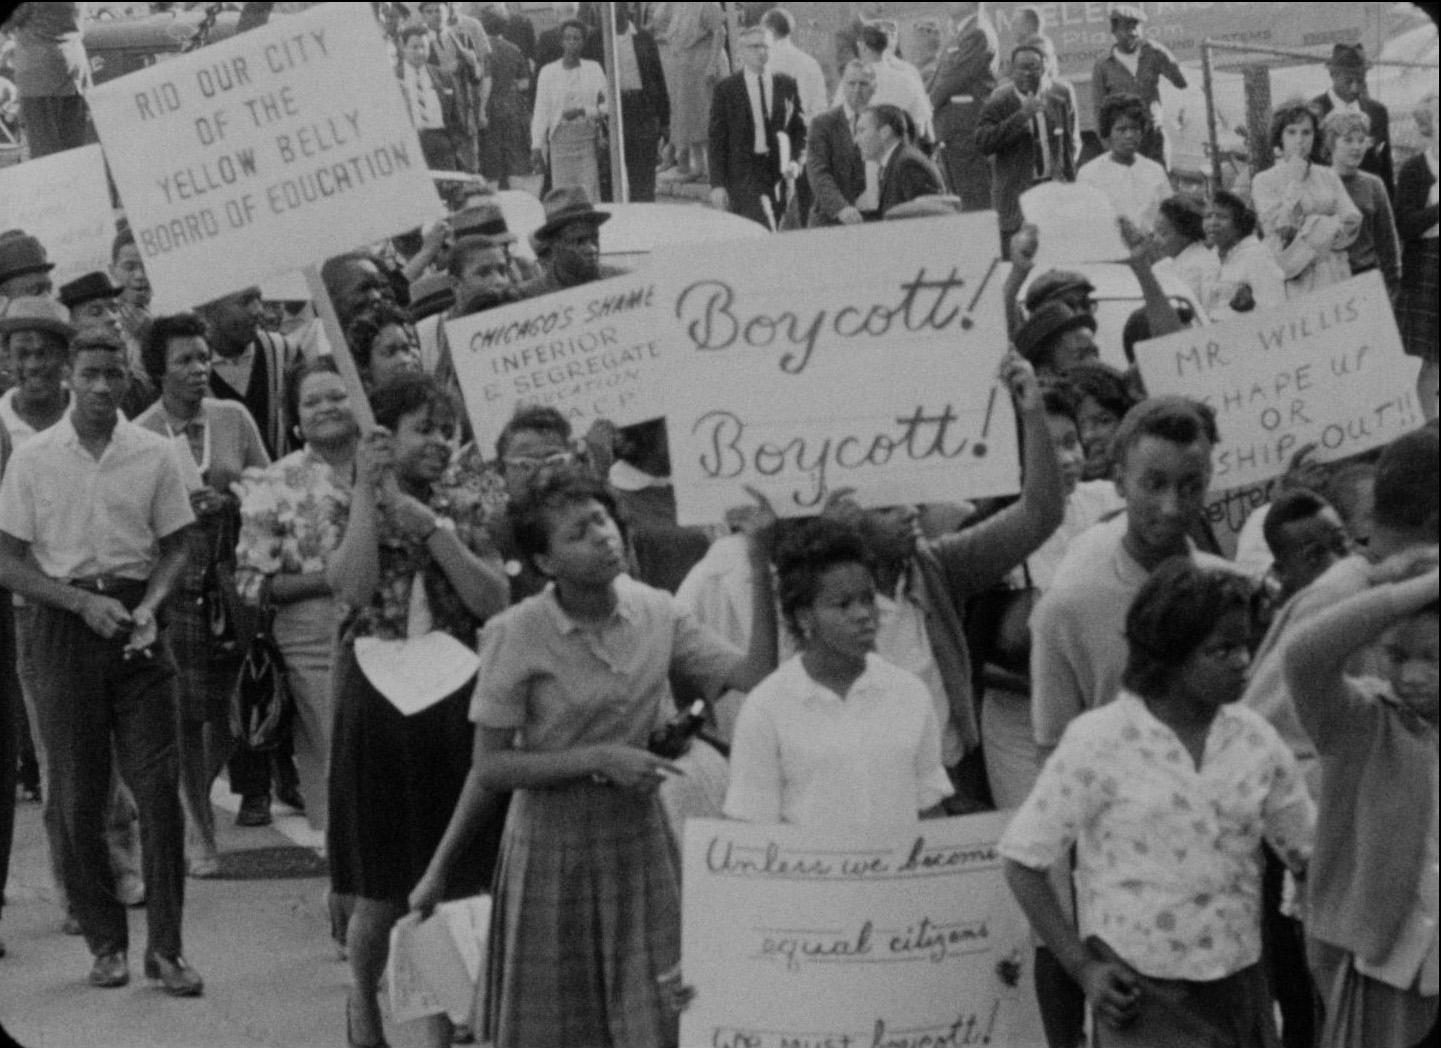 Montgomery Bus Boycott - Black History - HISTORY.com